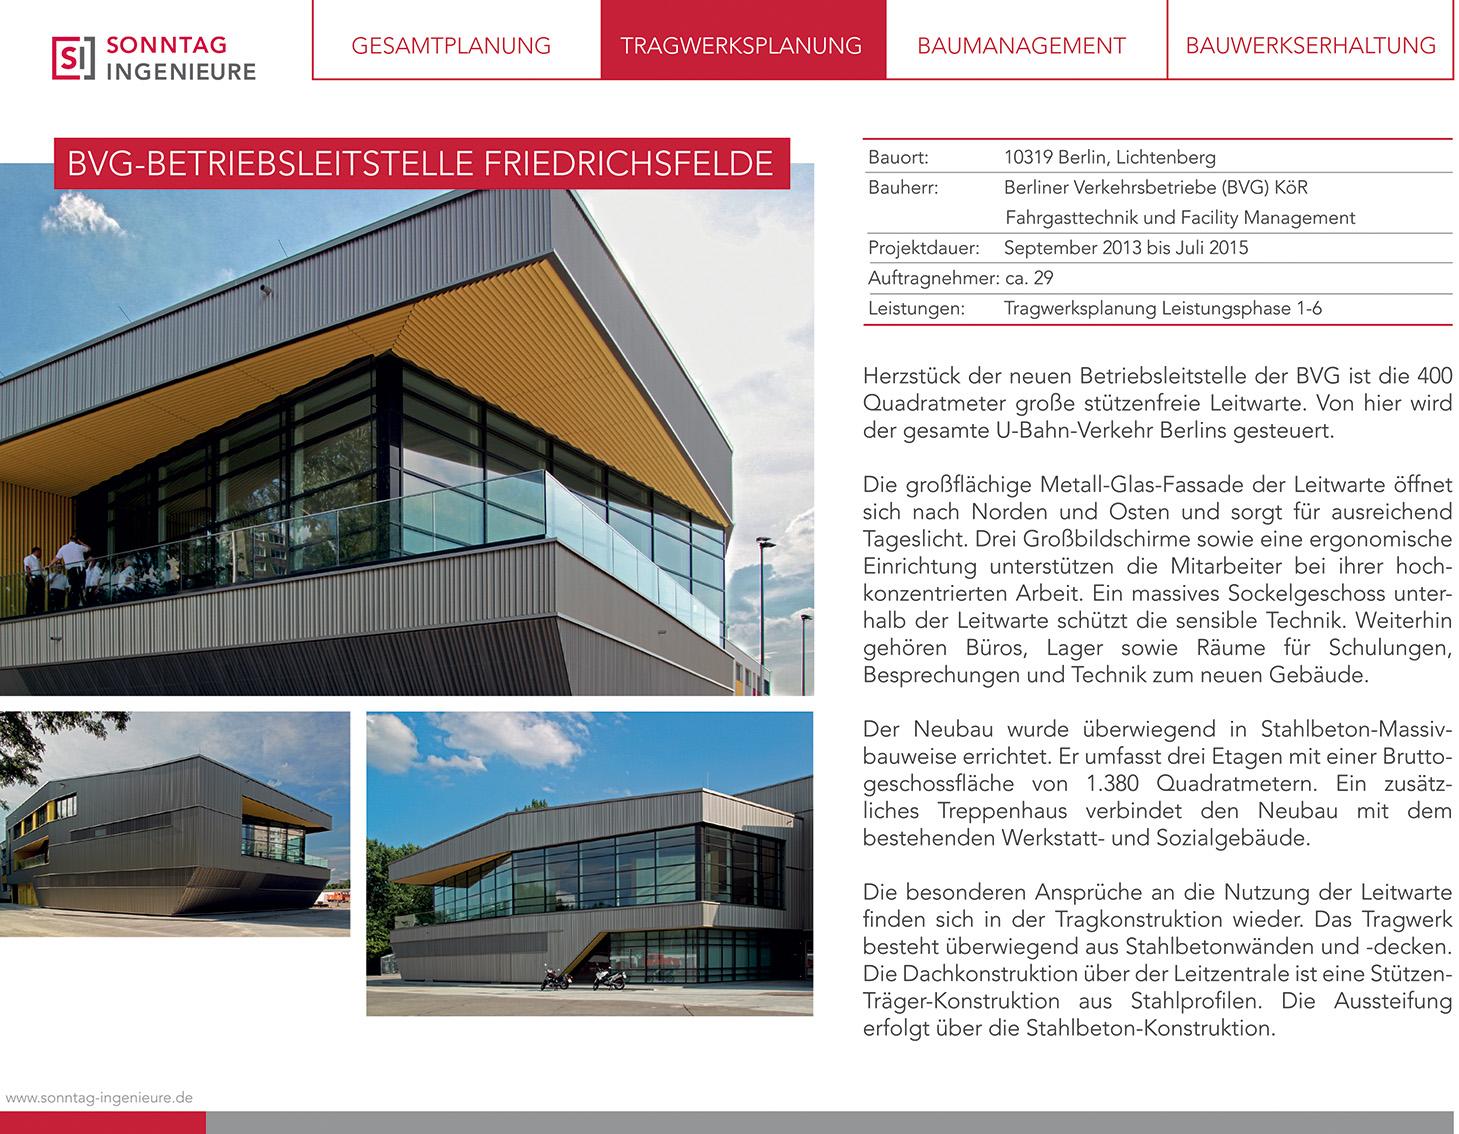 Infodatenblatt zum Bauprojekt BVG-Betriebsleitstelle Friedrichsfelde